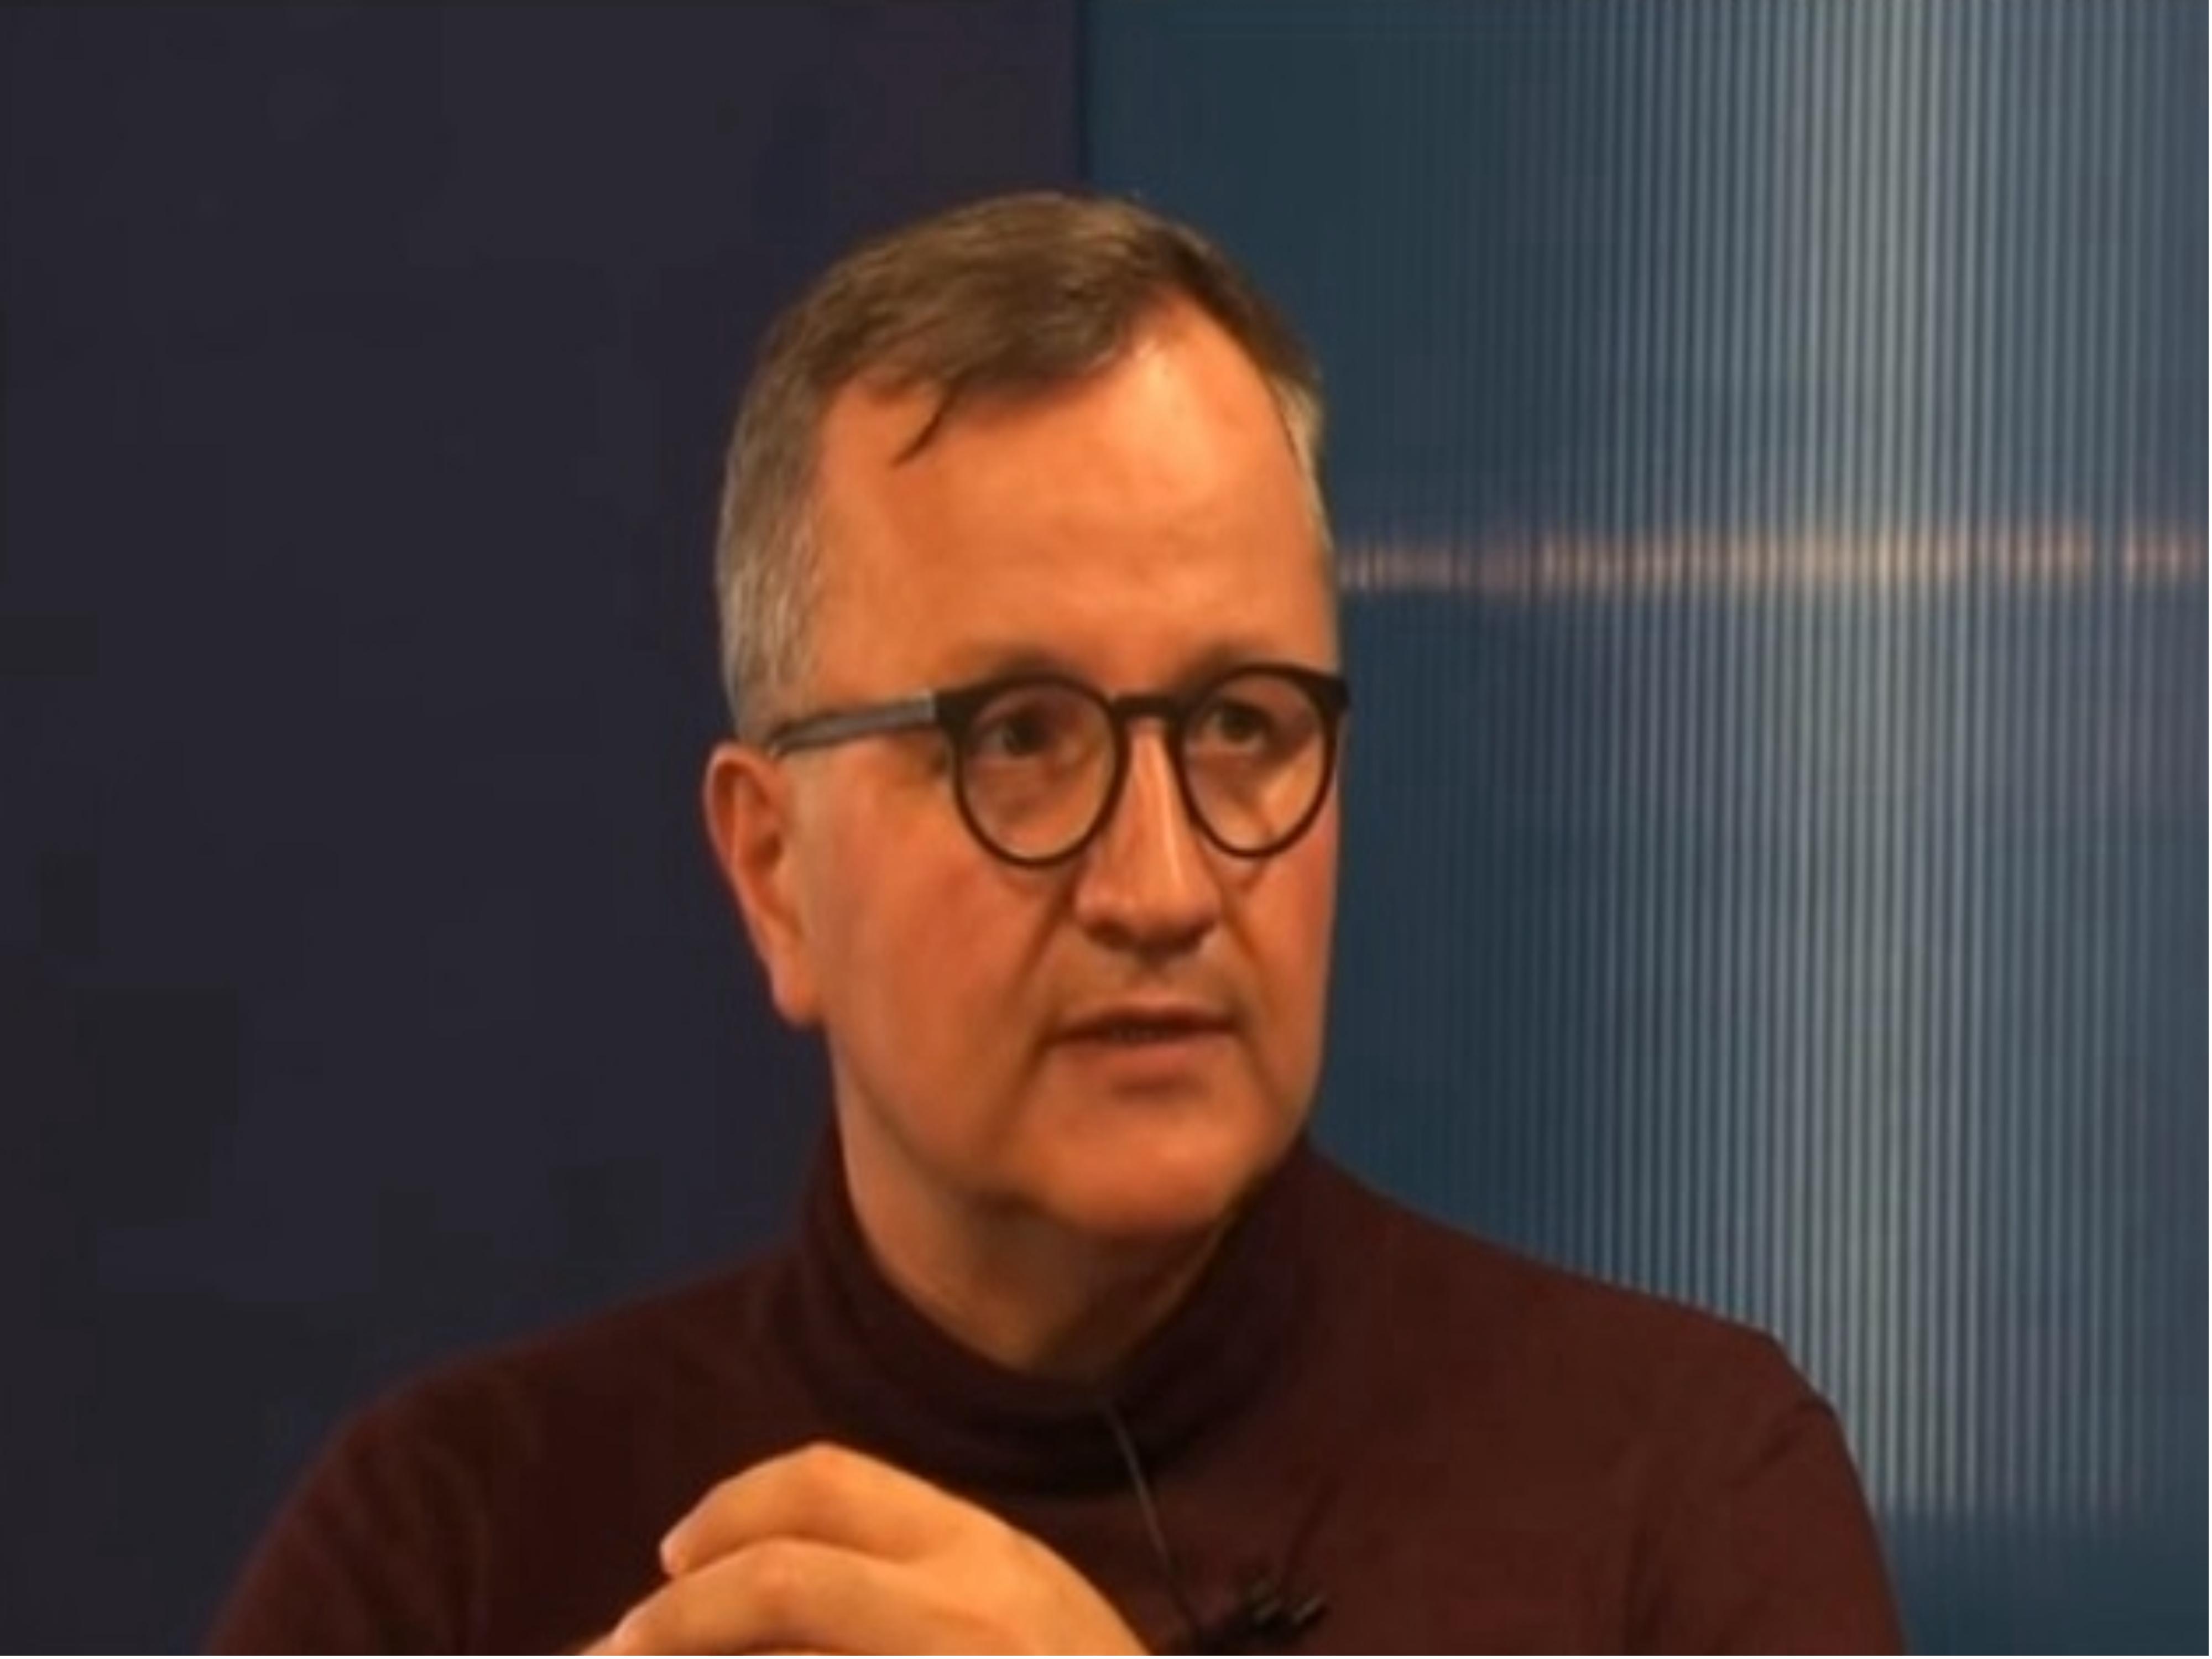 "Rechtsanwalt Wilfried Schmitz: ""Das eigene Kind nach brutaler Gewalt zu verlieren kann jede Familie treffen"" – Fall Verdacht Kindesmisshandlung"